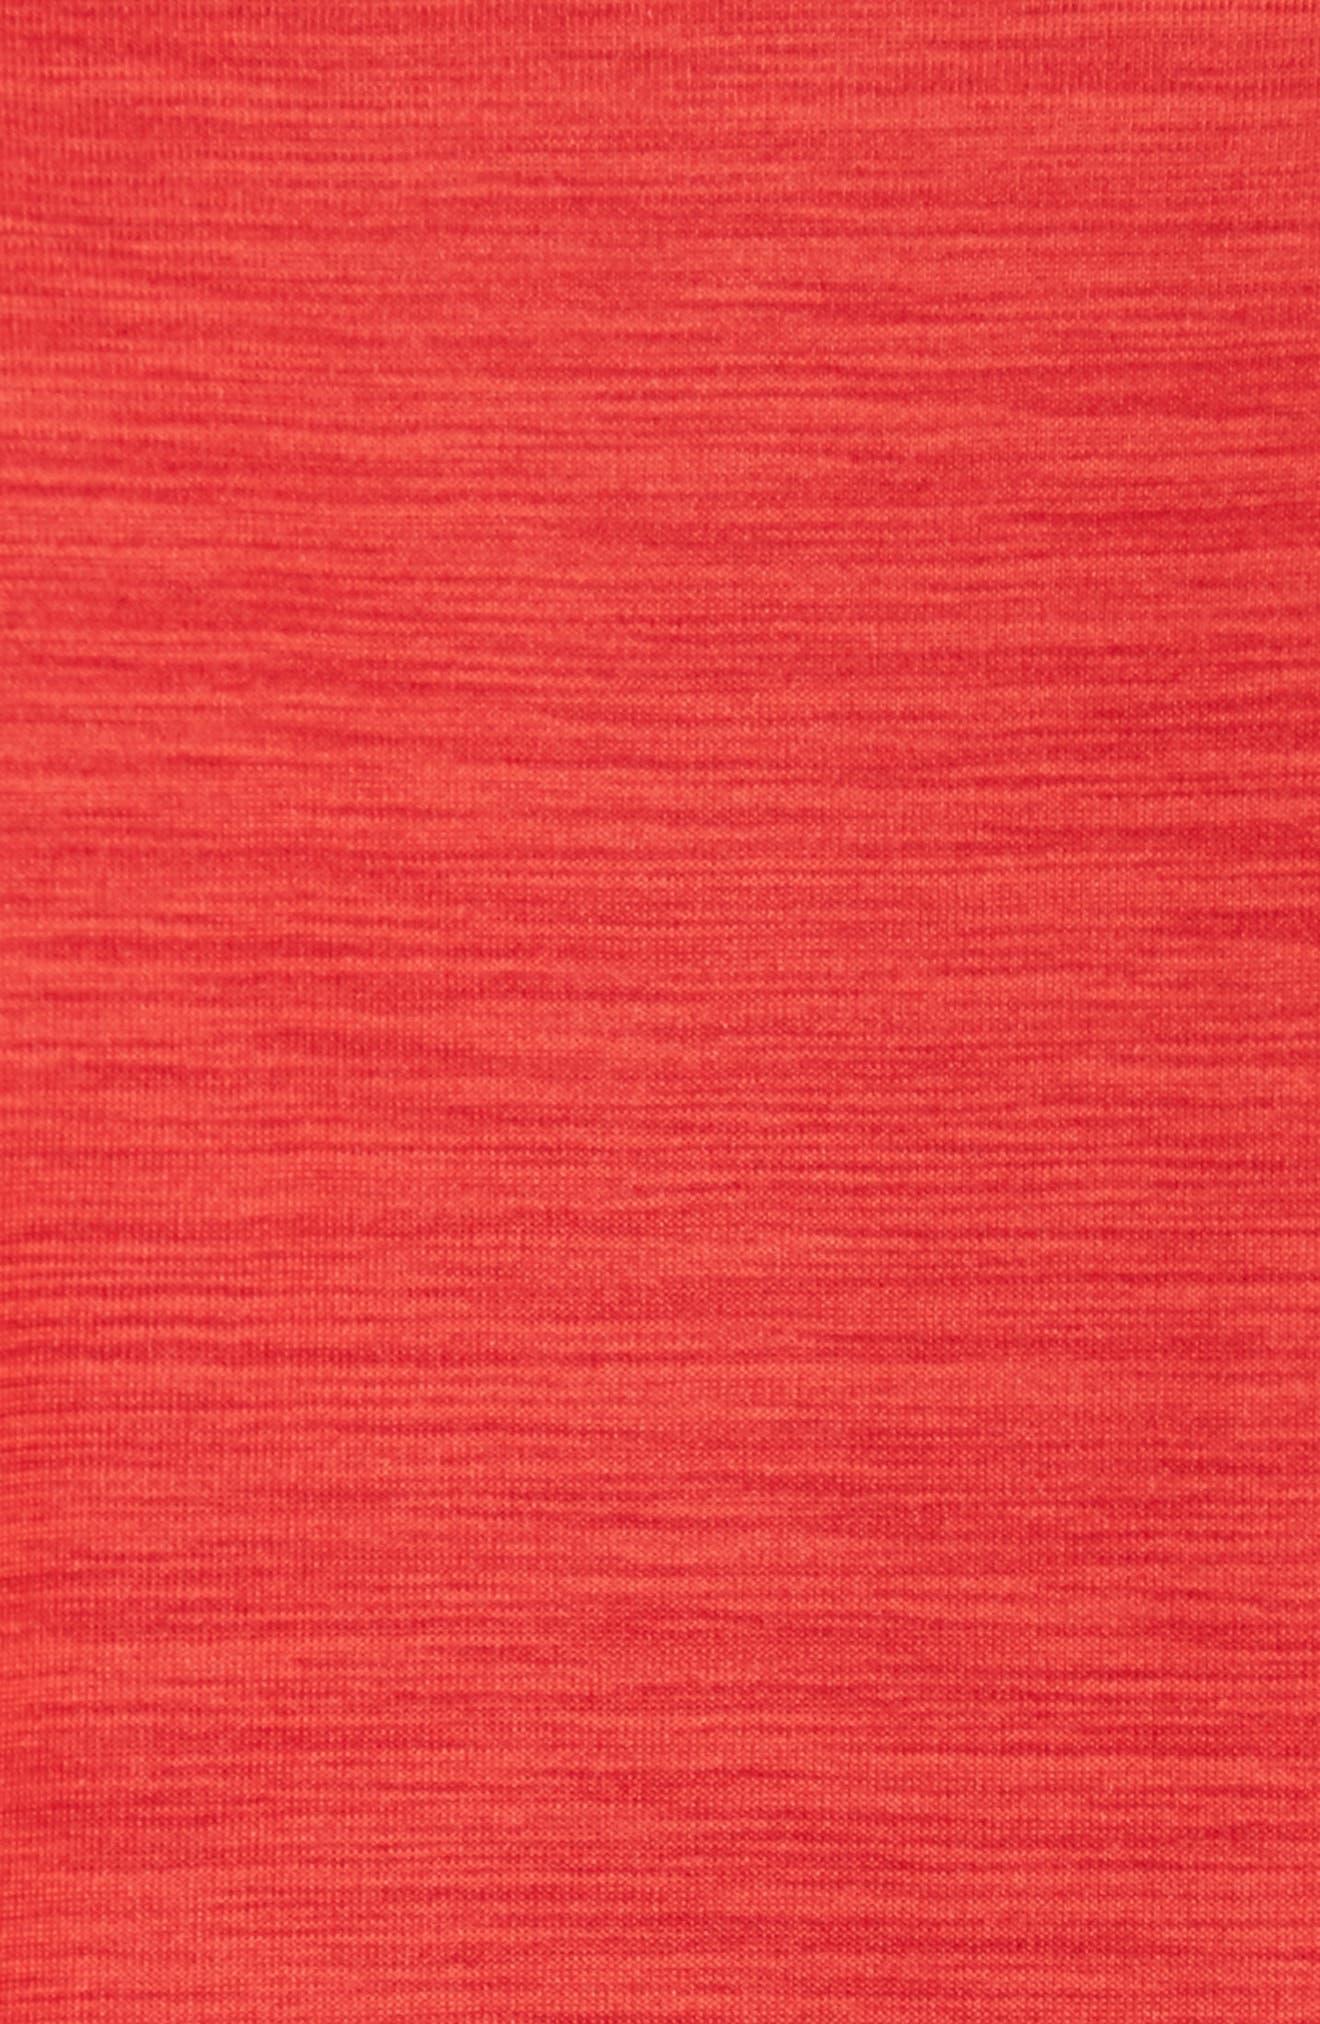 Dry Medalist Running Top,                             Alternate thumbnail 5, color,                             Deep Burgundy/ Habanero Red